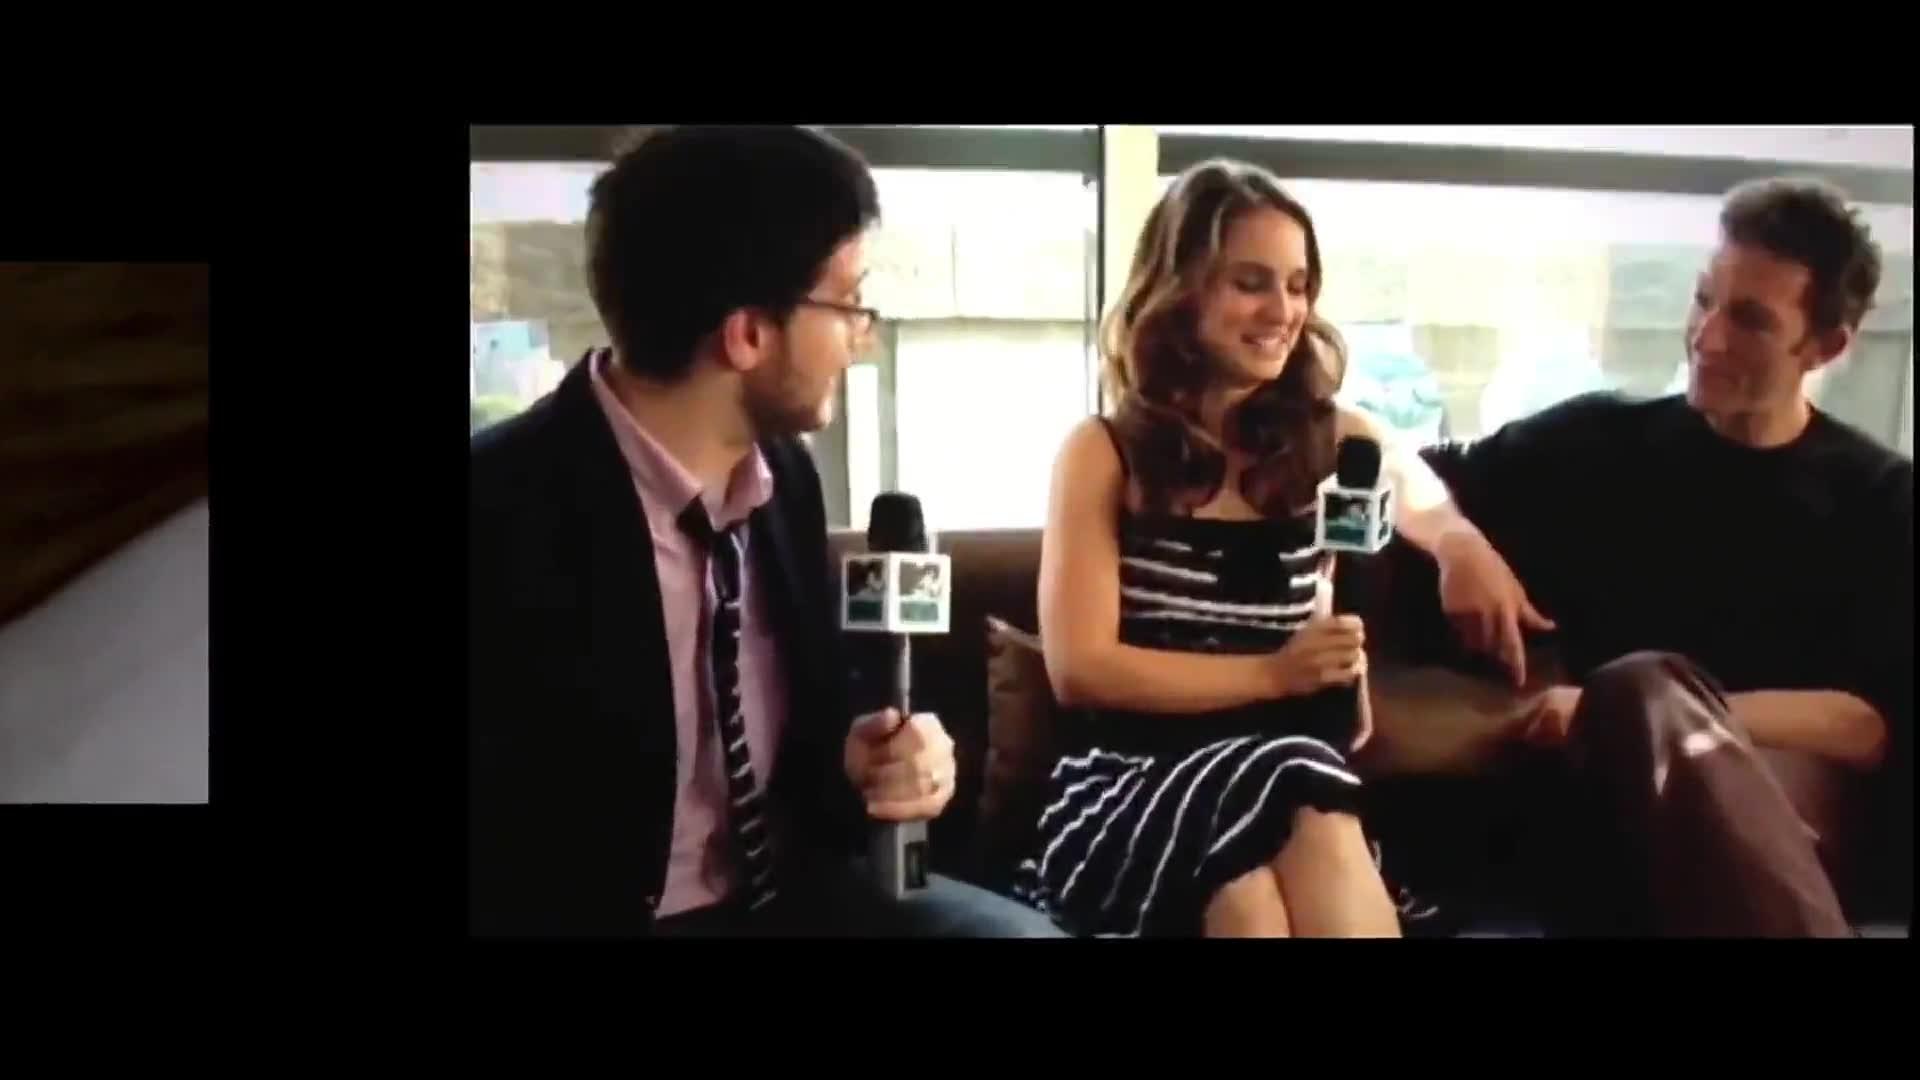 Natalie Portman masturbating in Sticky a self love story